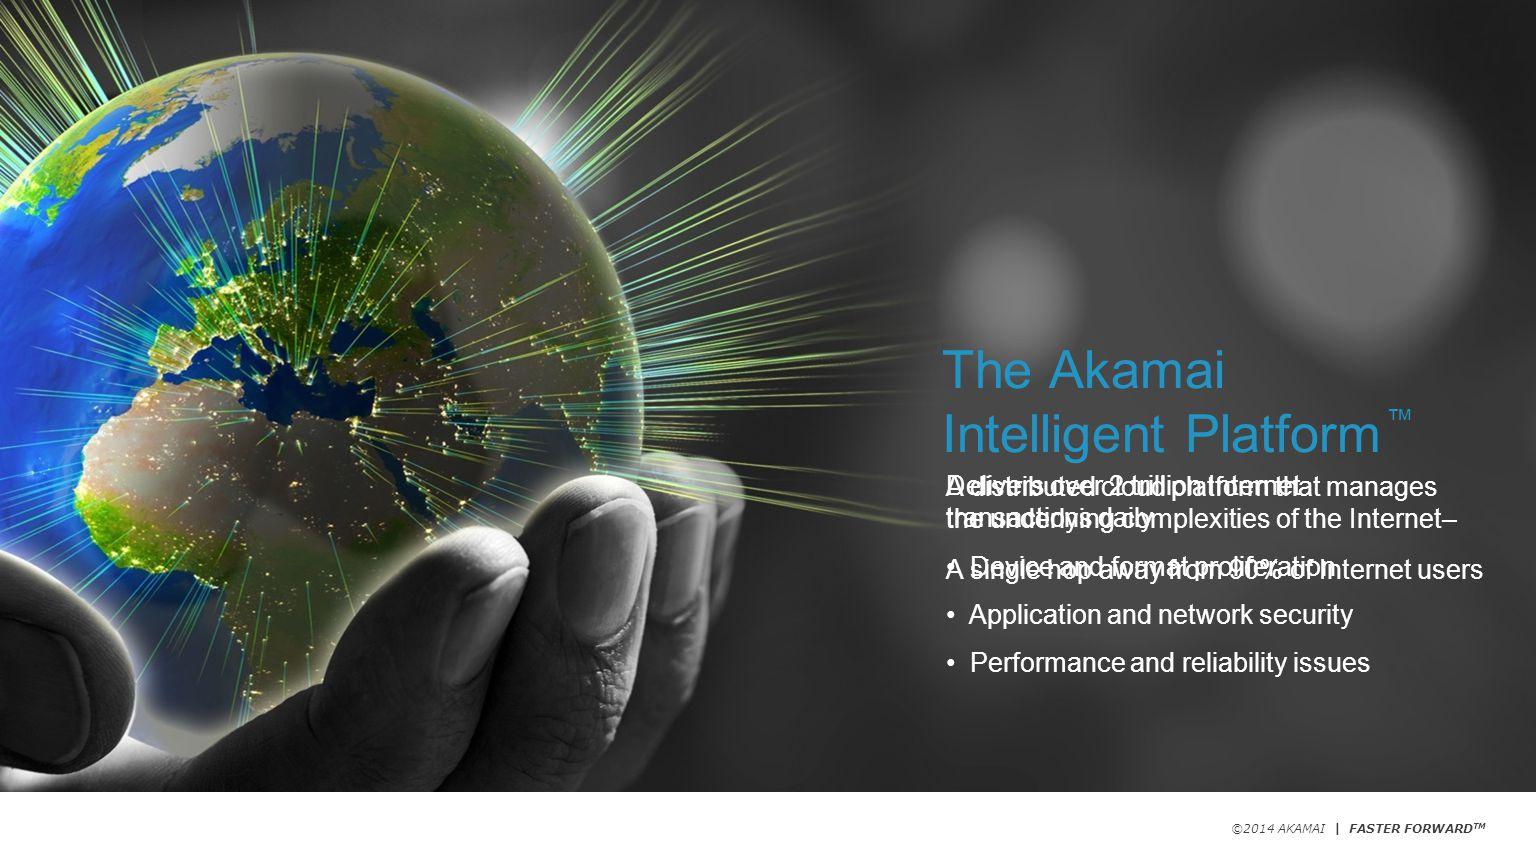 ©2013 AKAMAI | Proprietary & Confidential - FASTER FORWARD TM Packet Loss: Akamaized vs.